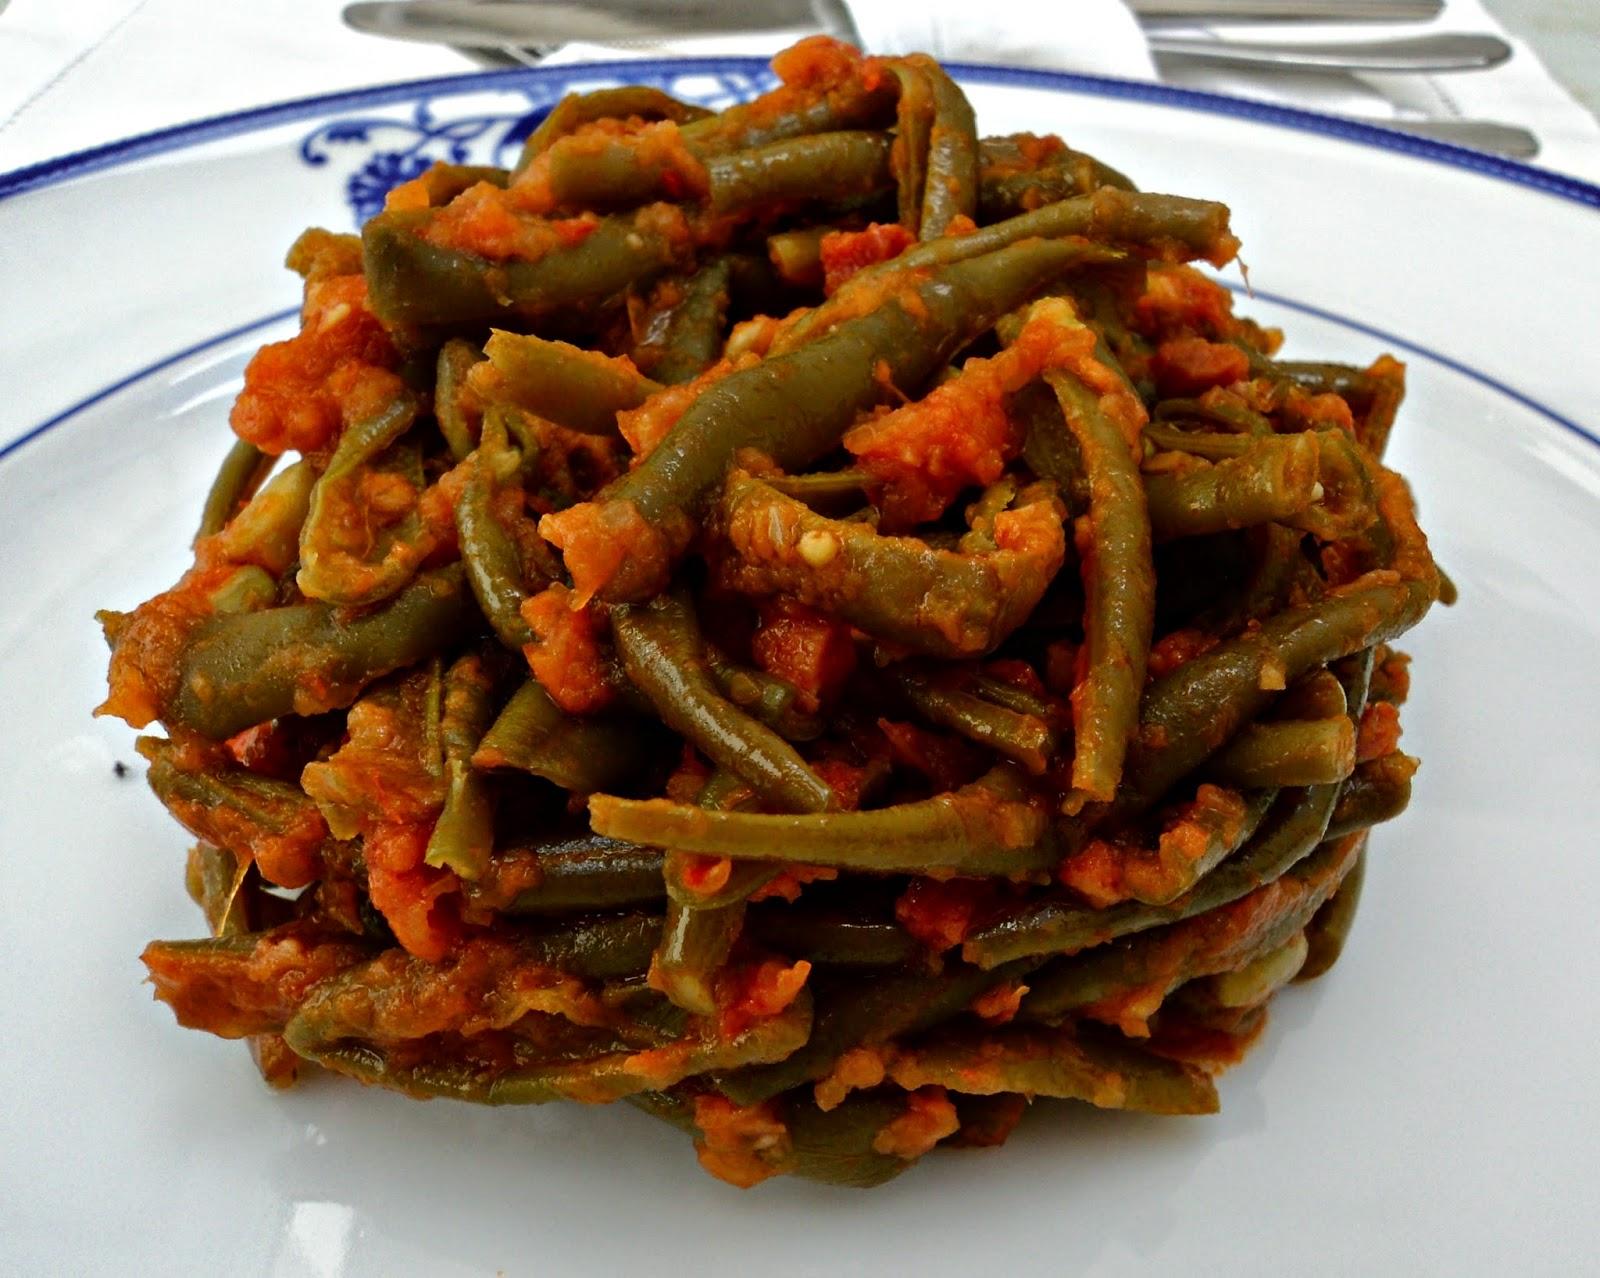 receta casera ensalada templada judías verdes, tomate y jamón